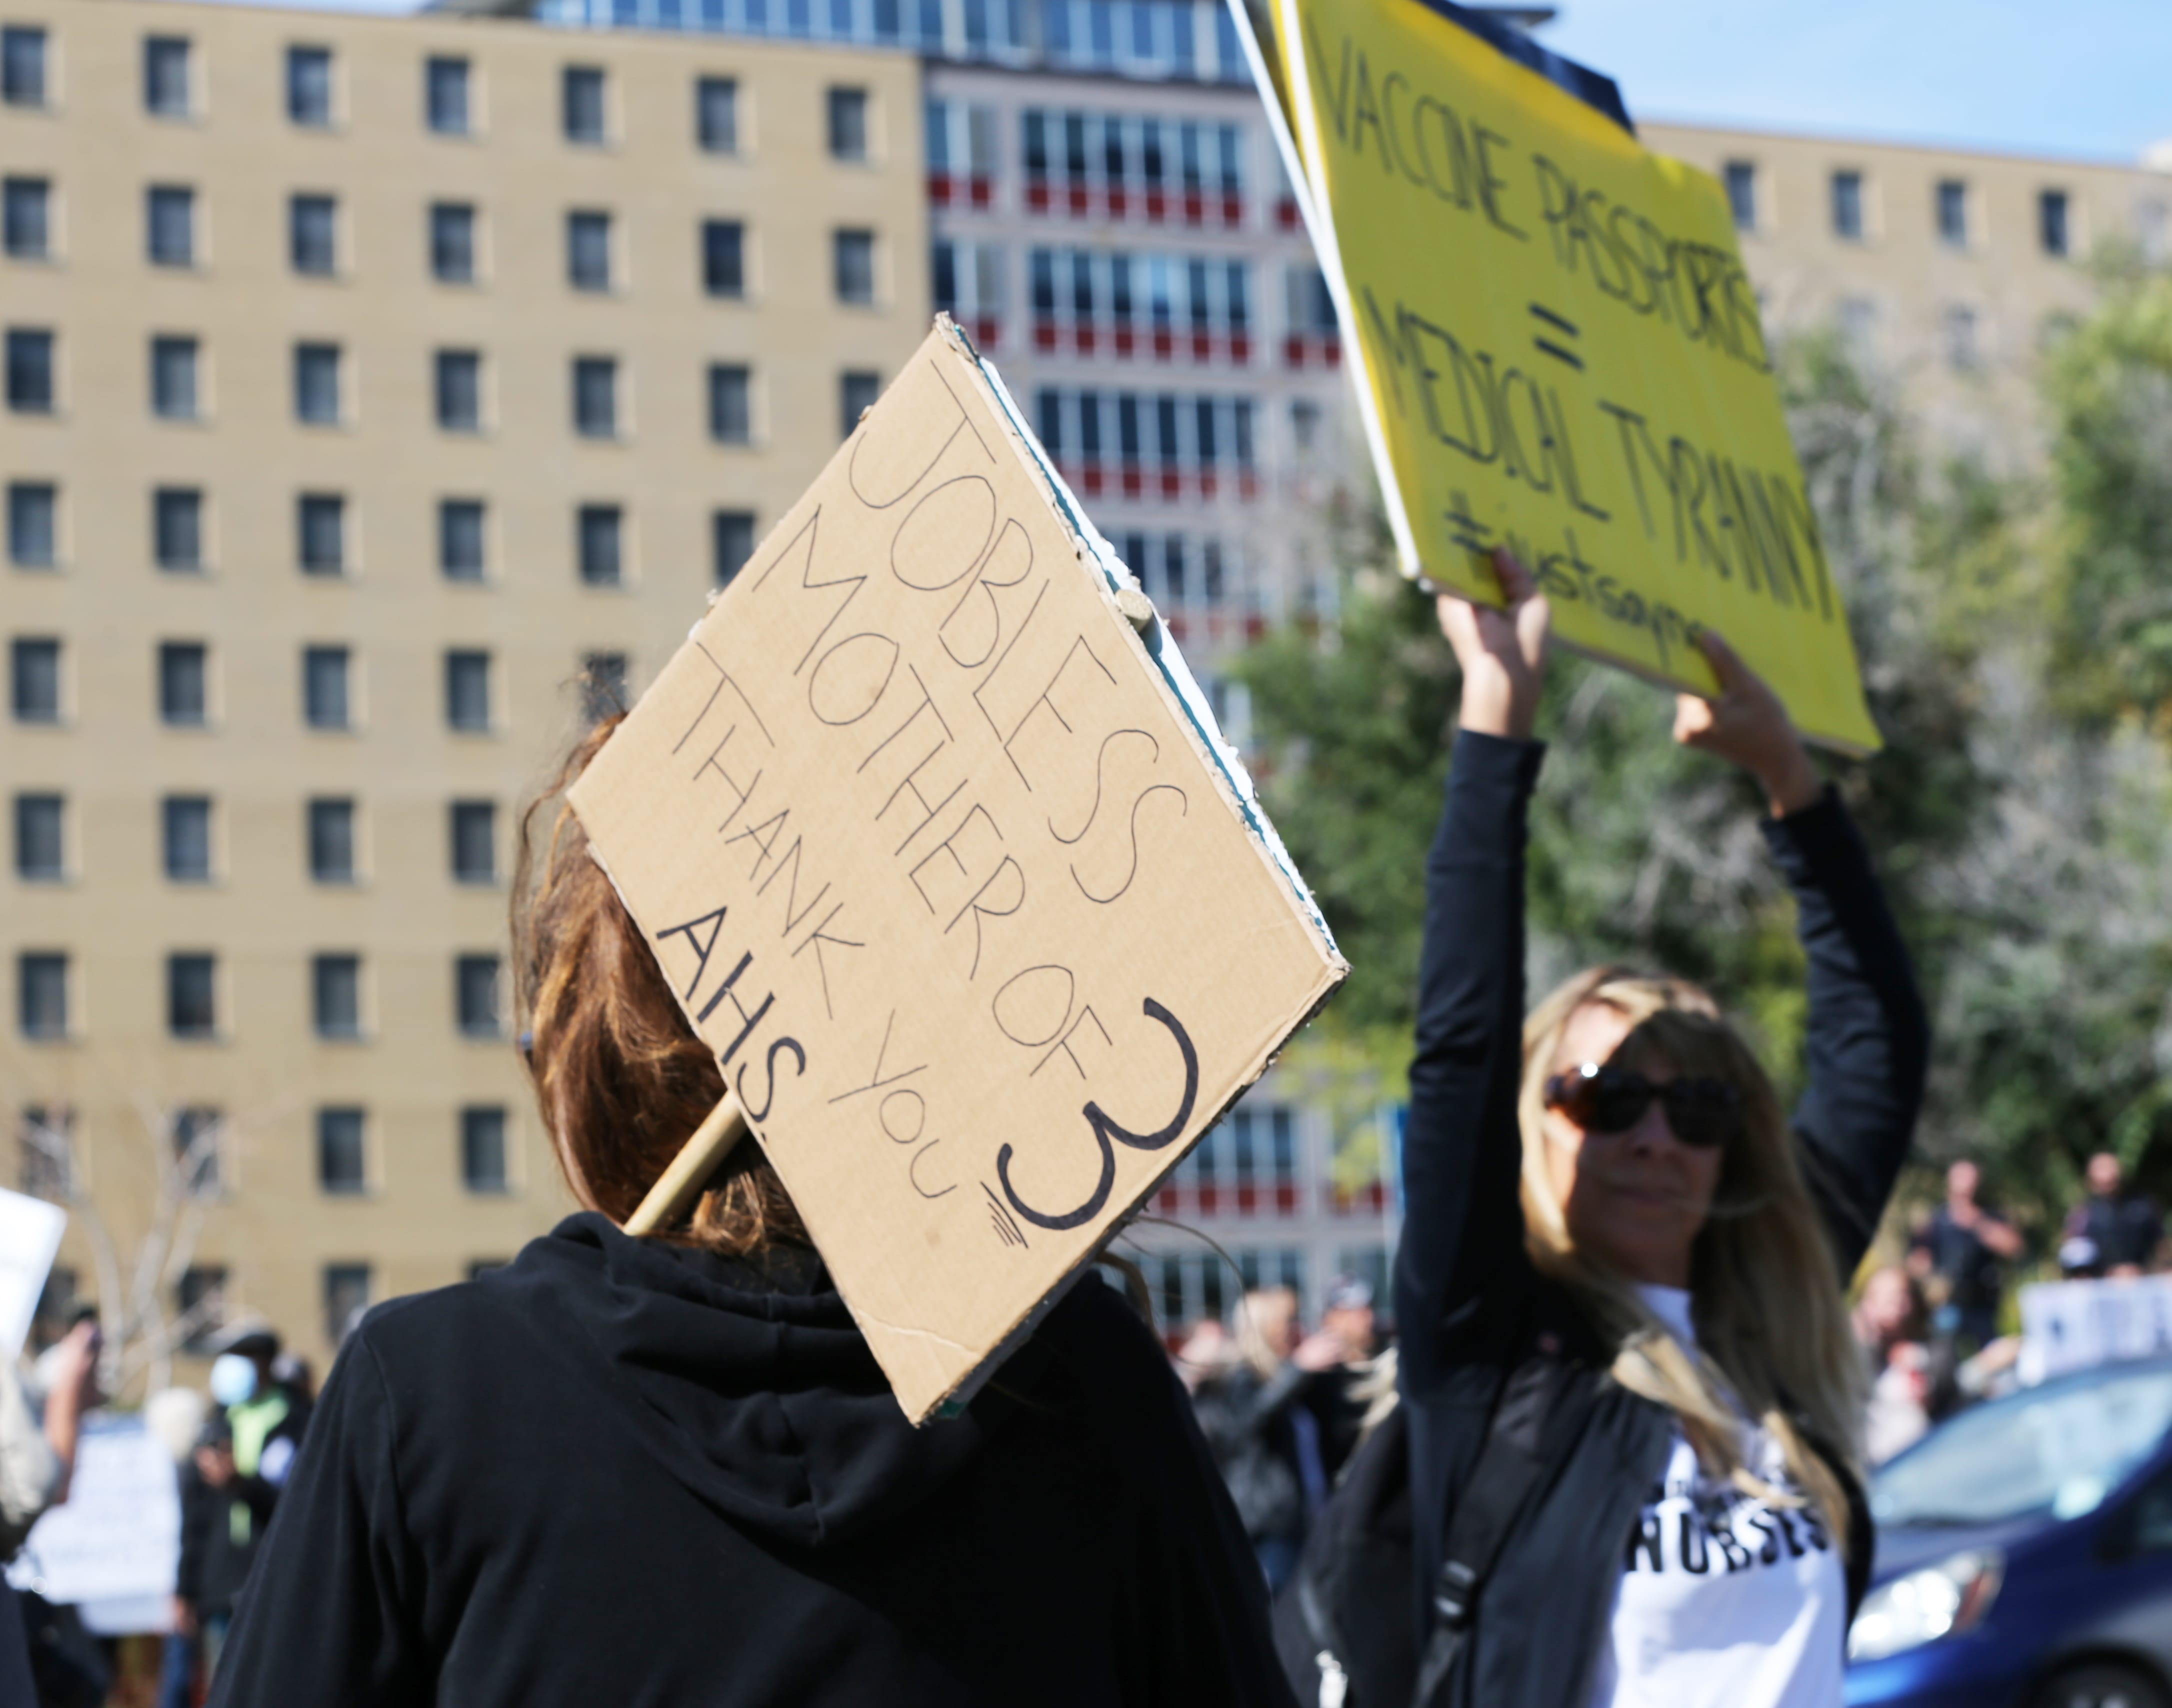 Silent Vigil against COVID-19 measures calgary alberta 13 09 2021 642-min.jpg